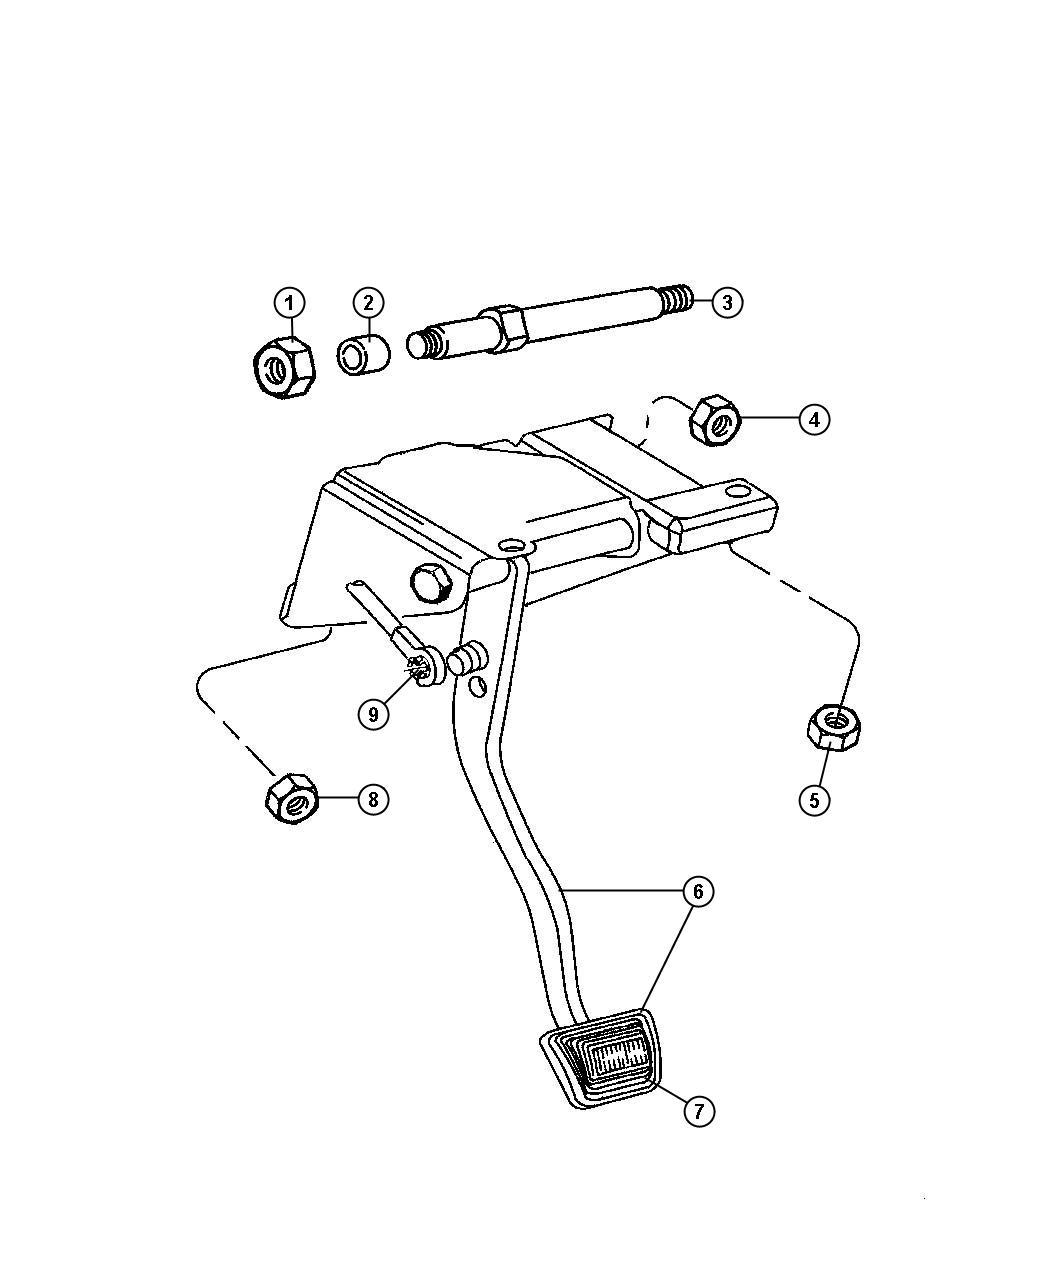 Jeep Wrangler Clutch Pedal Linkage